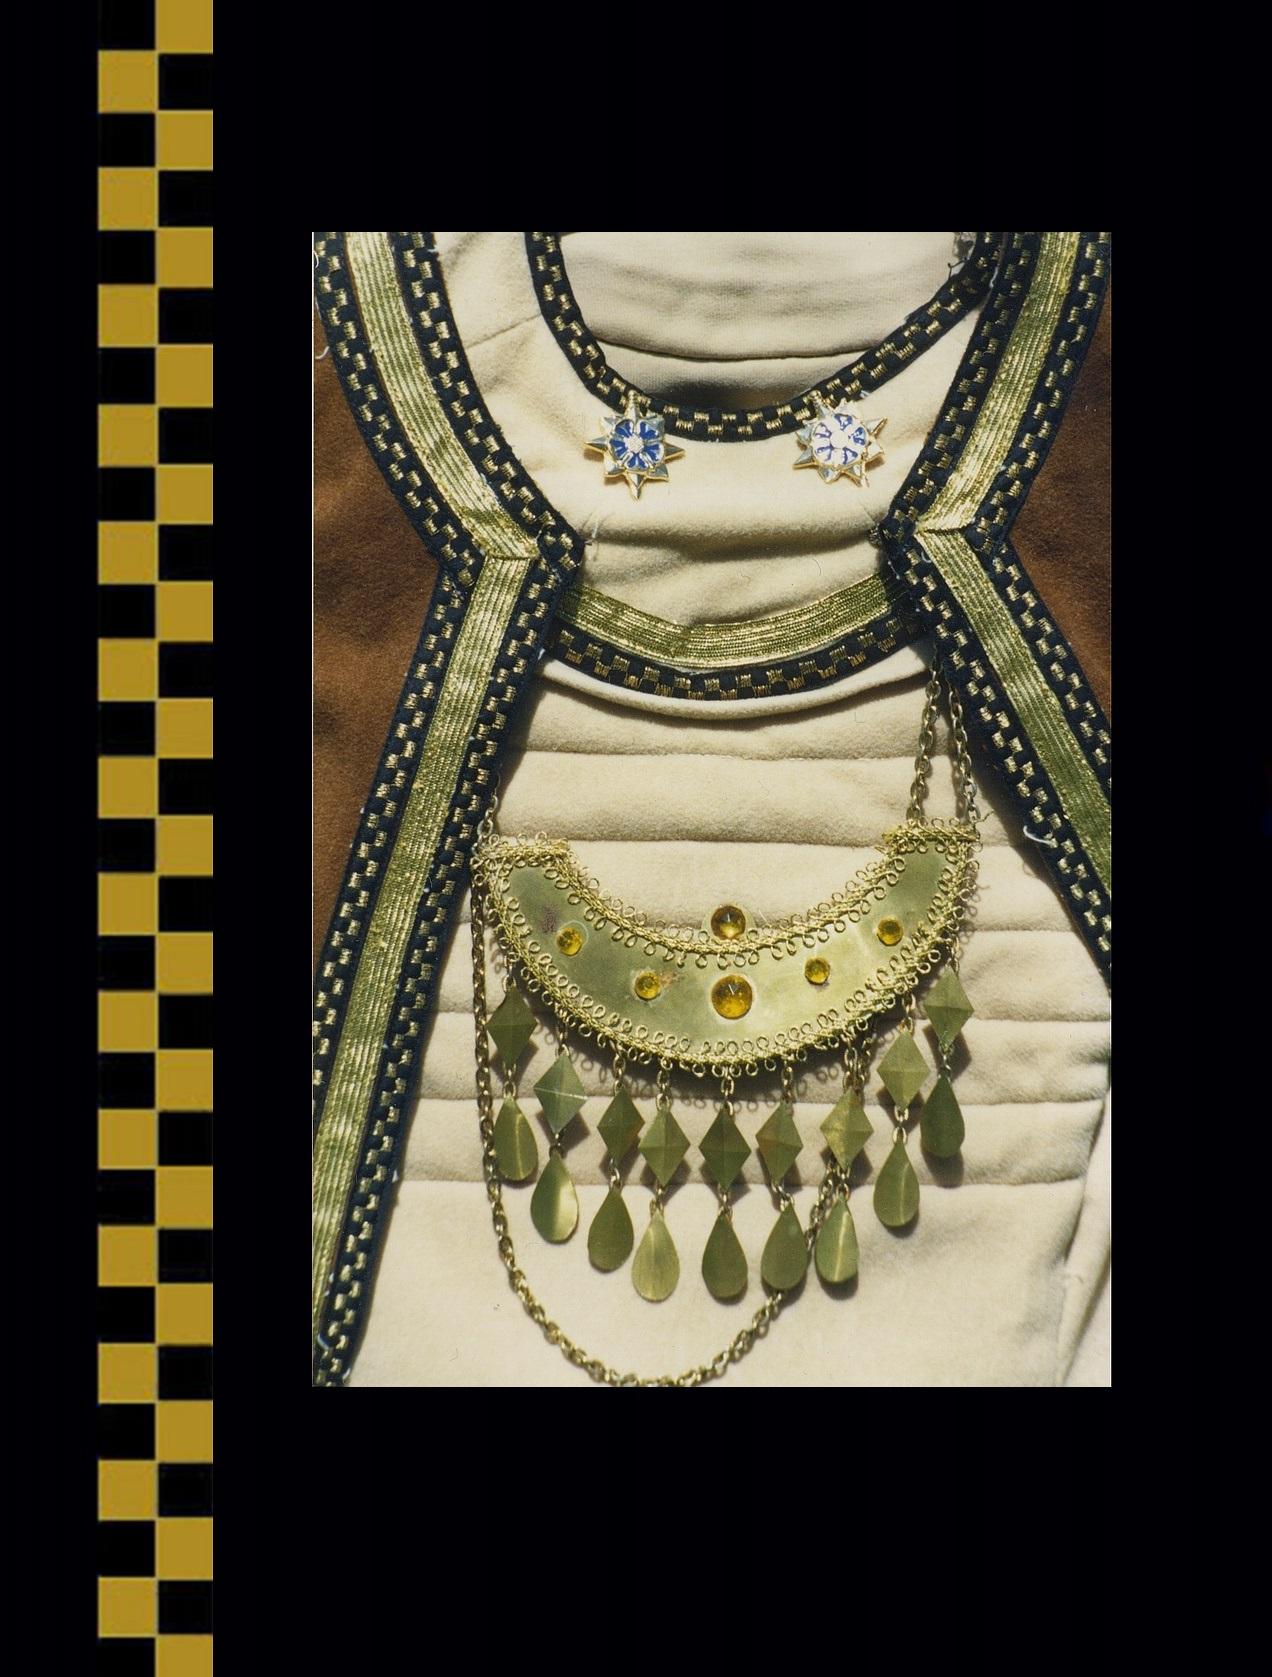 Colonial Warrior, dress uniform/dress medallion